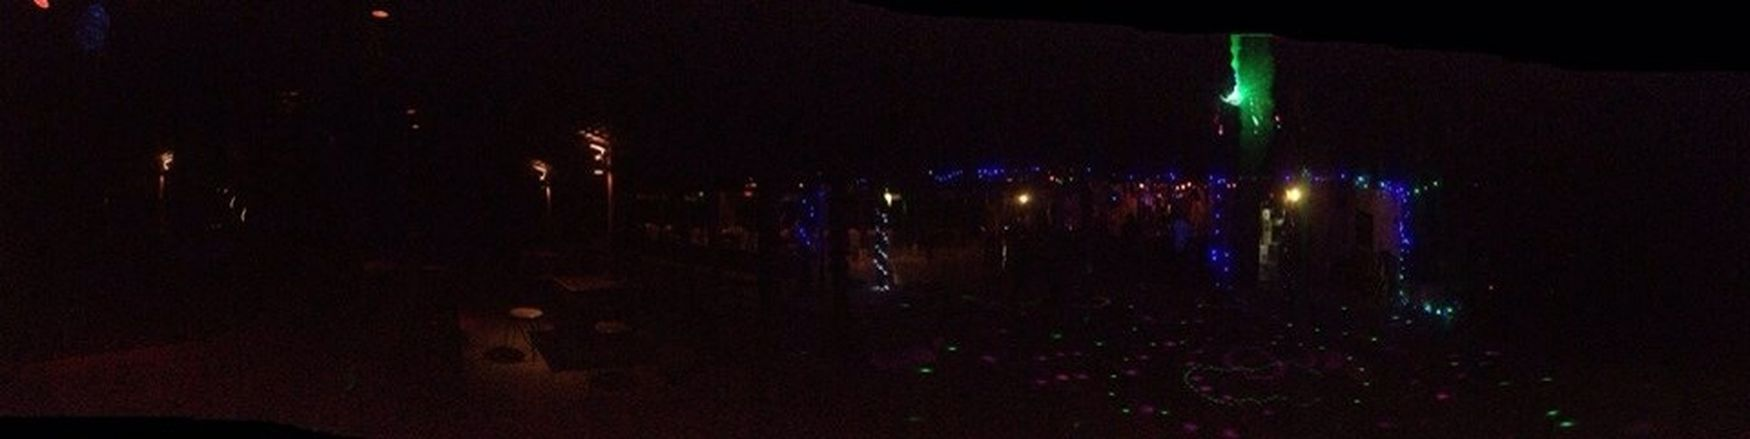 Merry Christmas Koh Siboya Krabi Thailand Party!